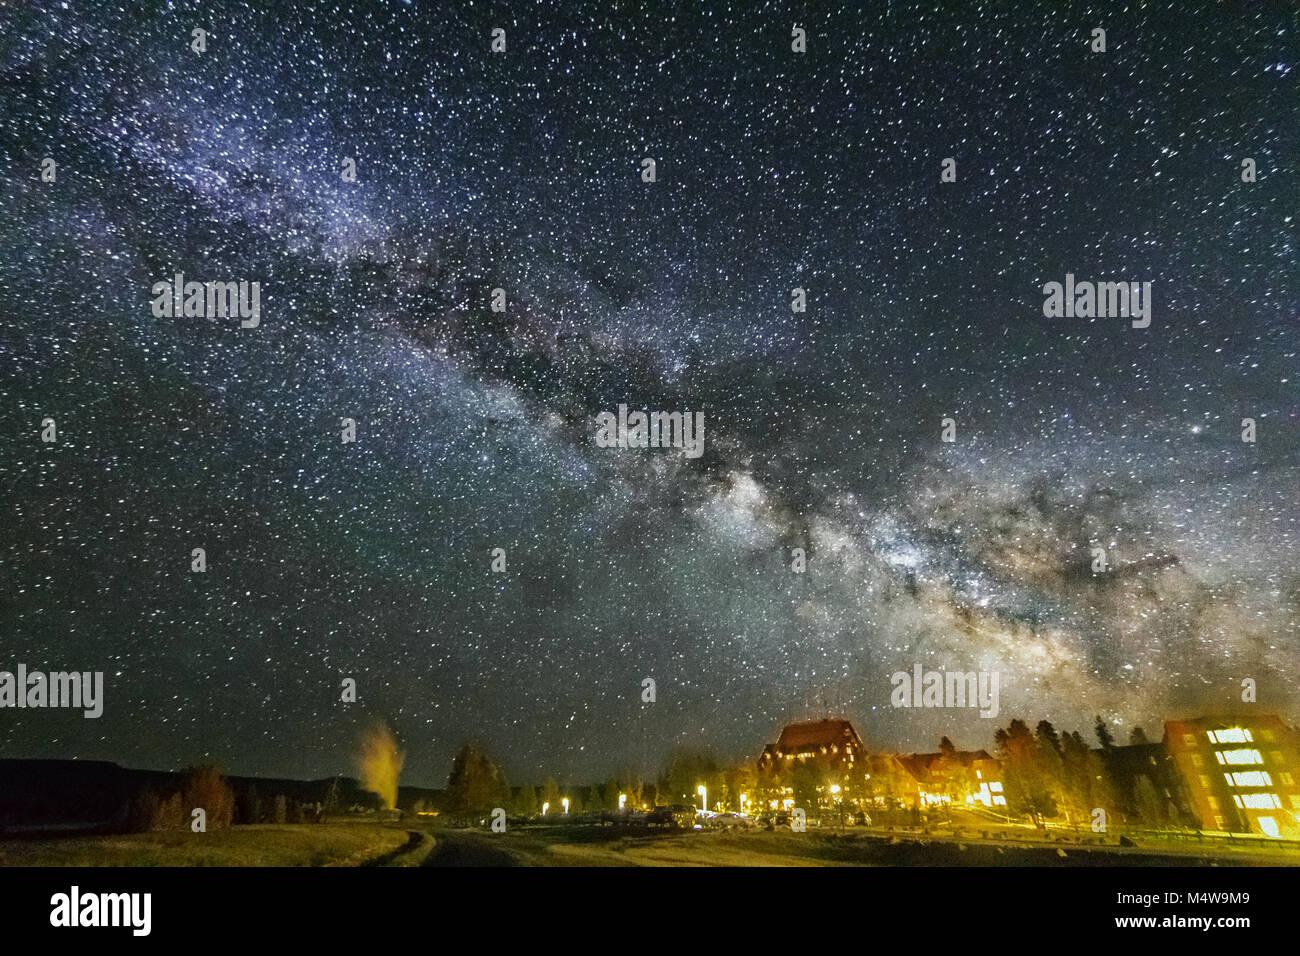 Milky Way over Old Faithful, Yellowstone National Park - Stock Image